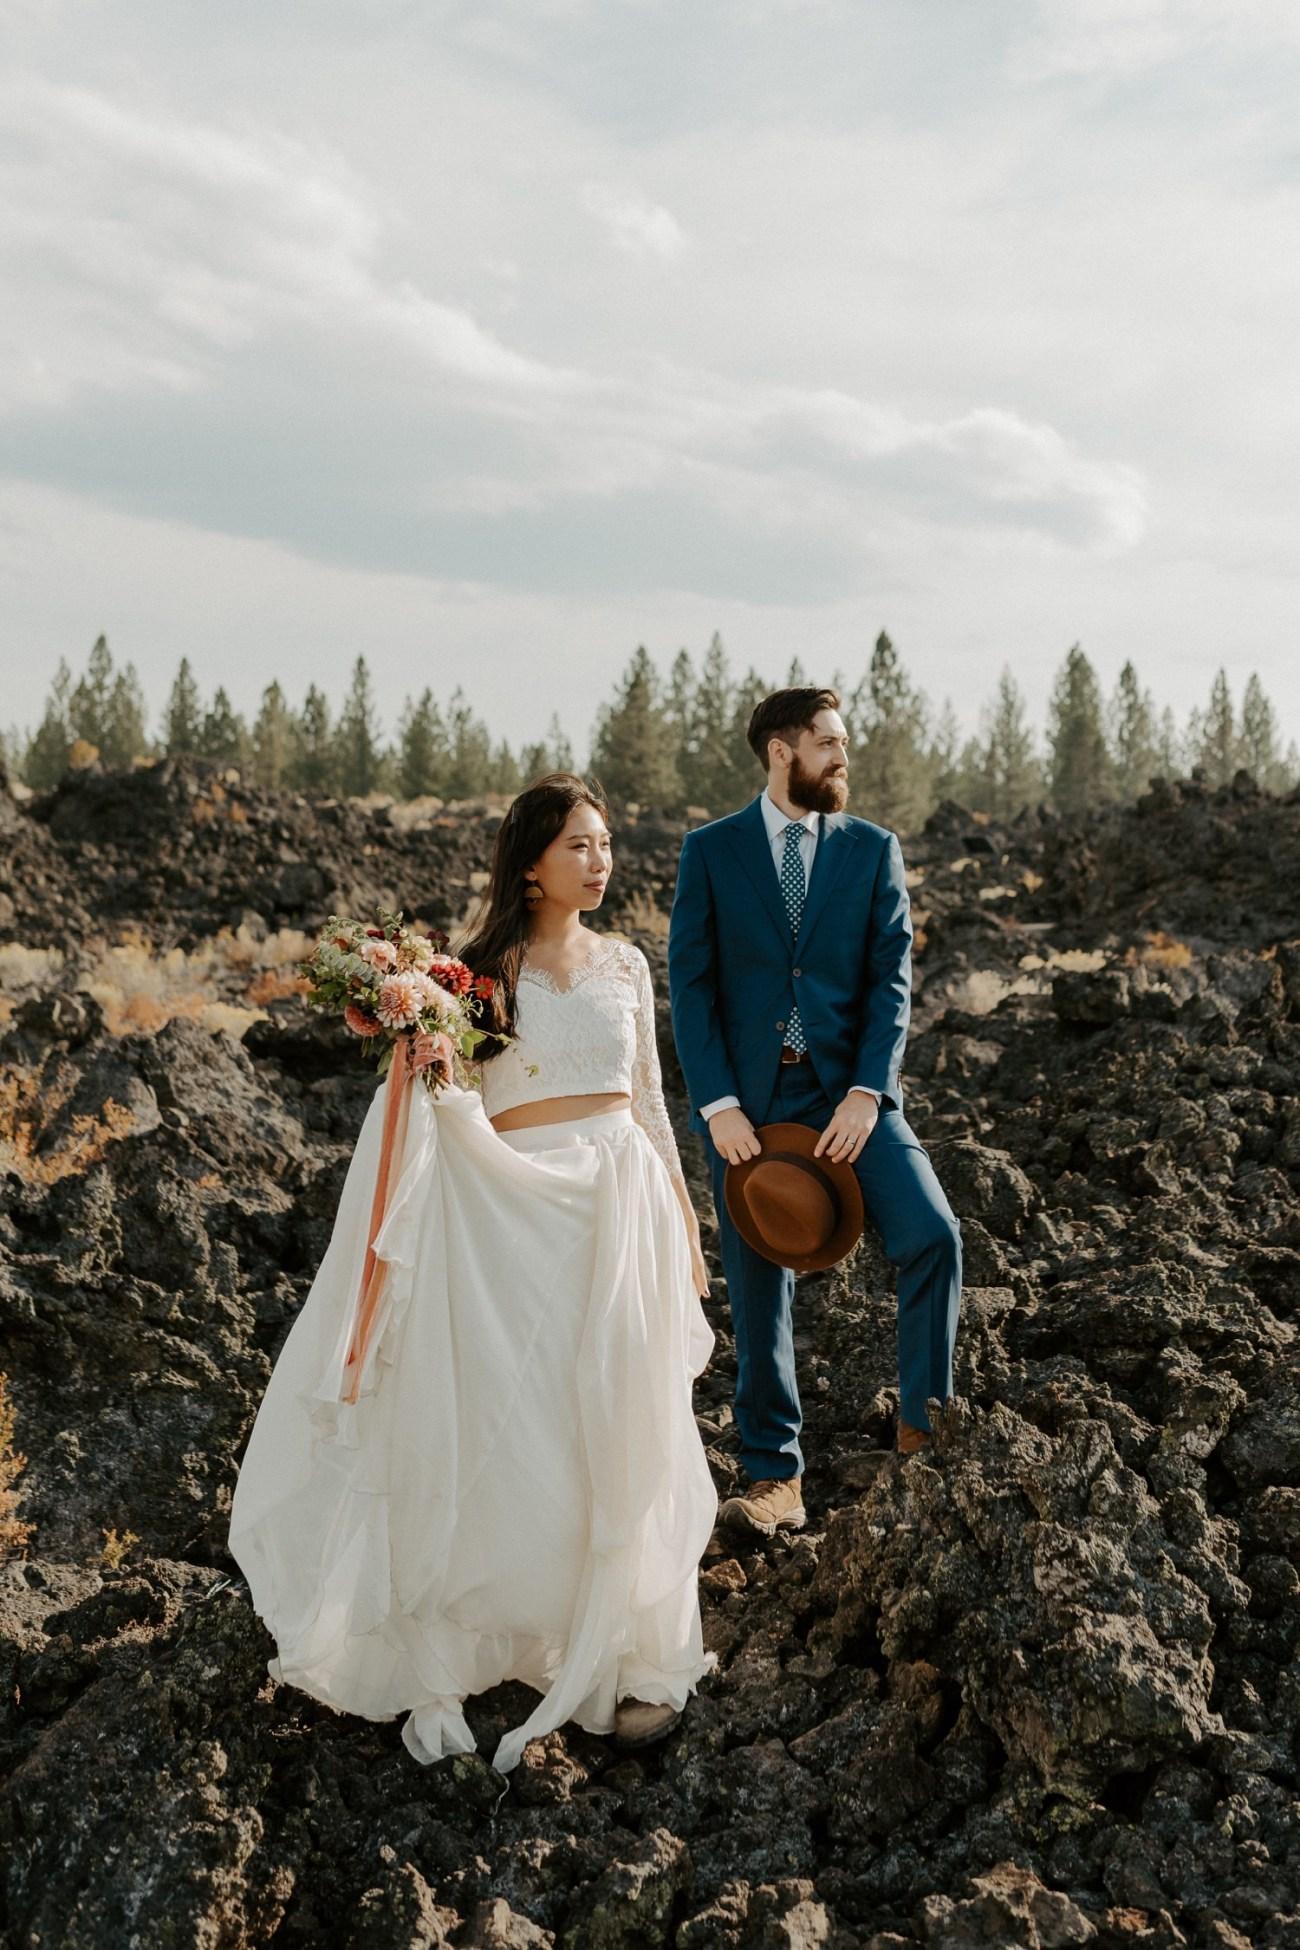 Newberry Volcano Elopement Bend Elopement Bridal Session Bend Wedding Photographer Anais Possamai Photography 007